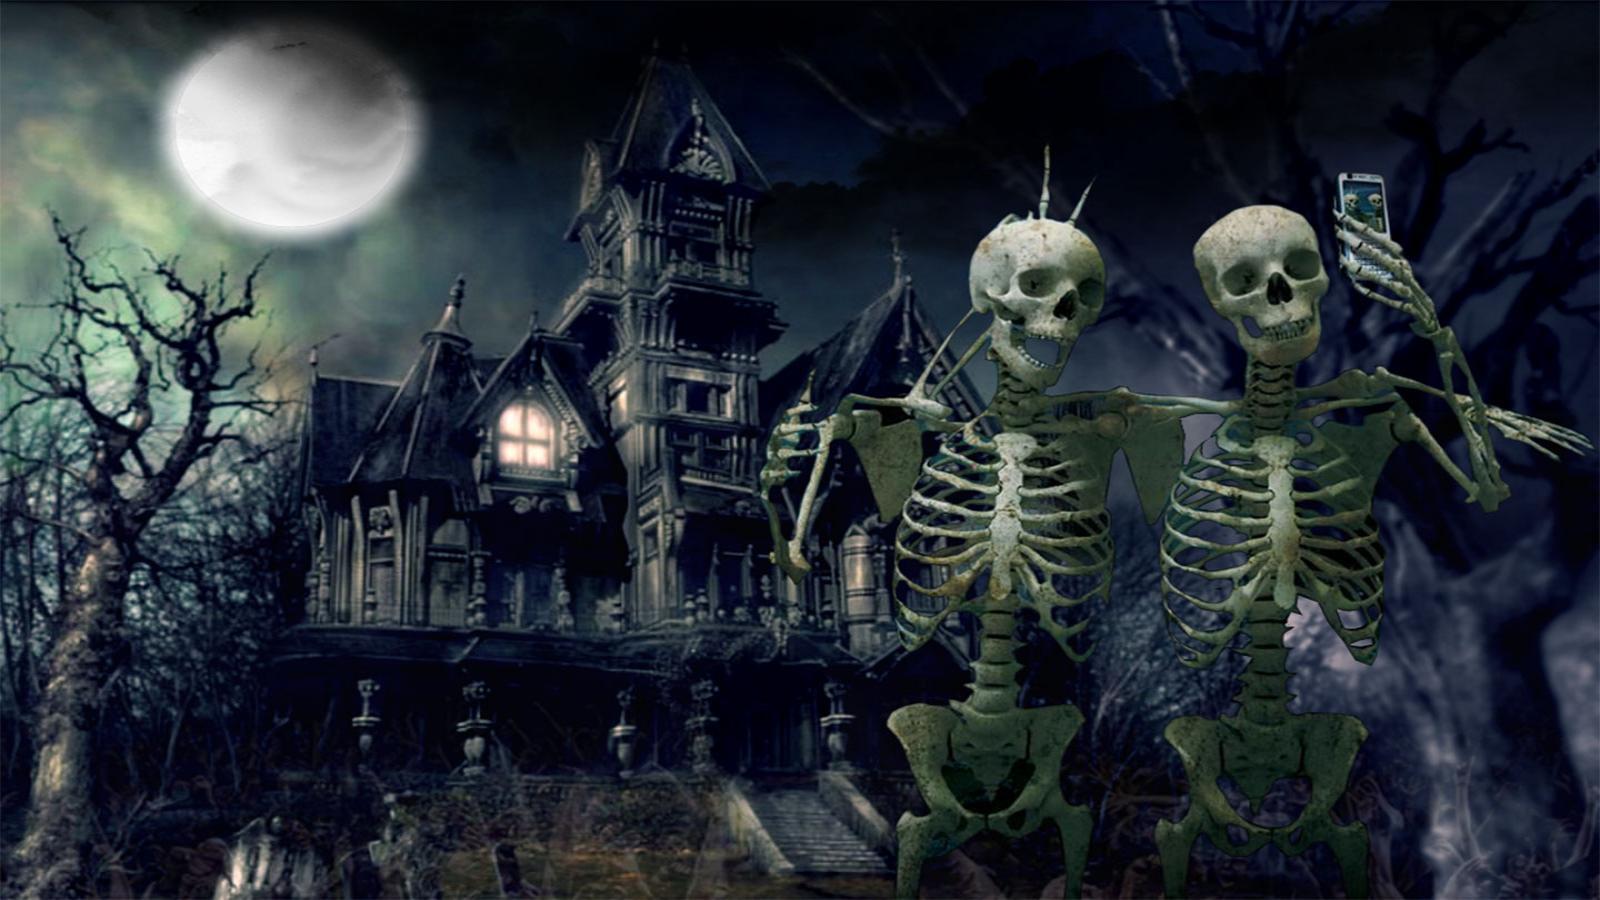 scary haloween photos